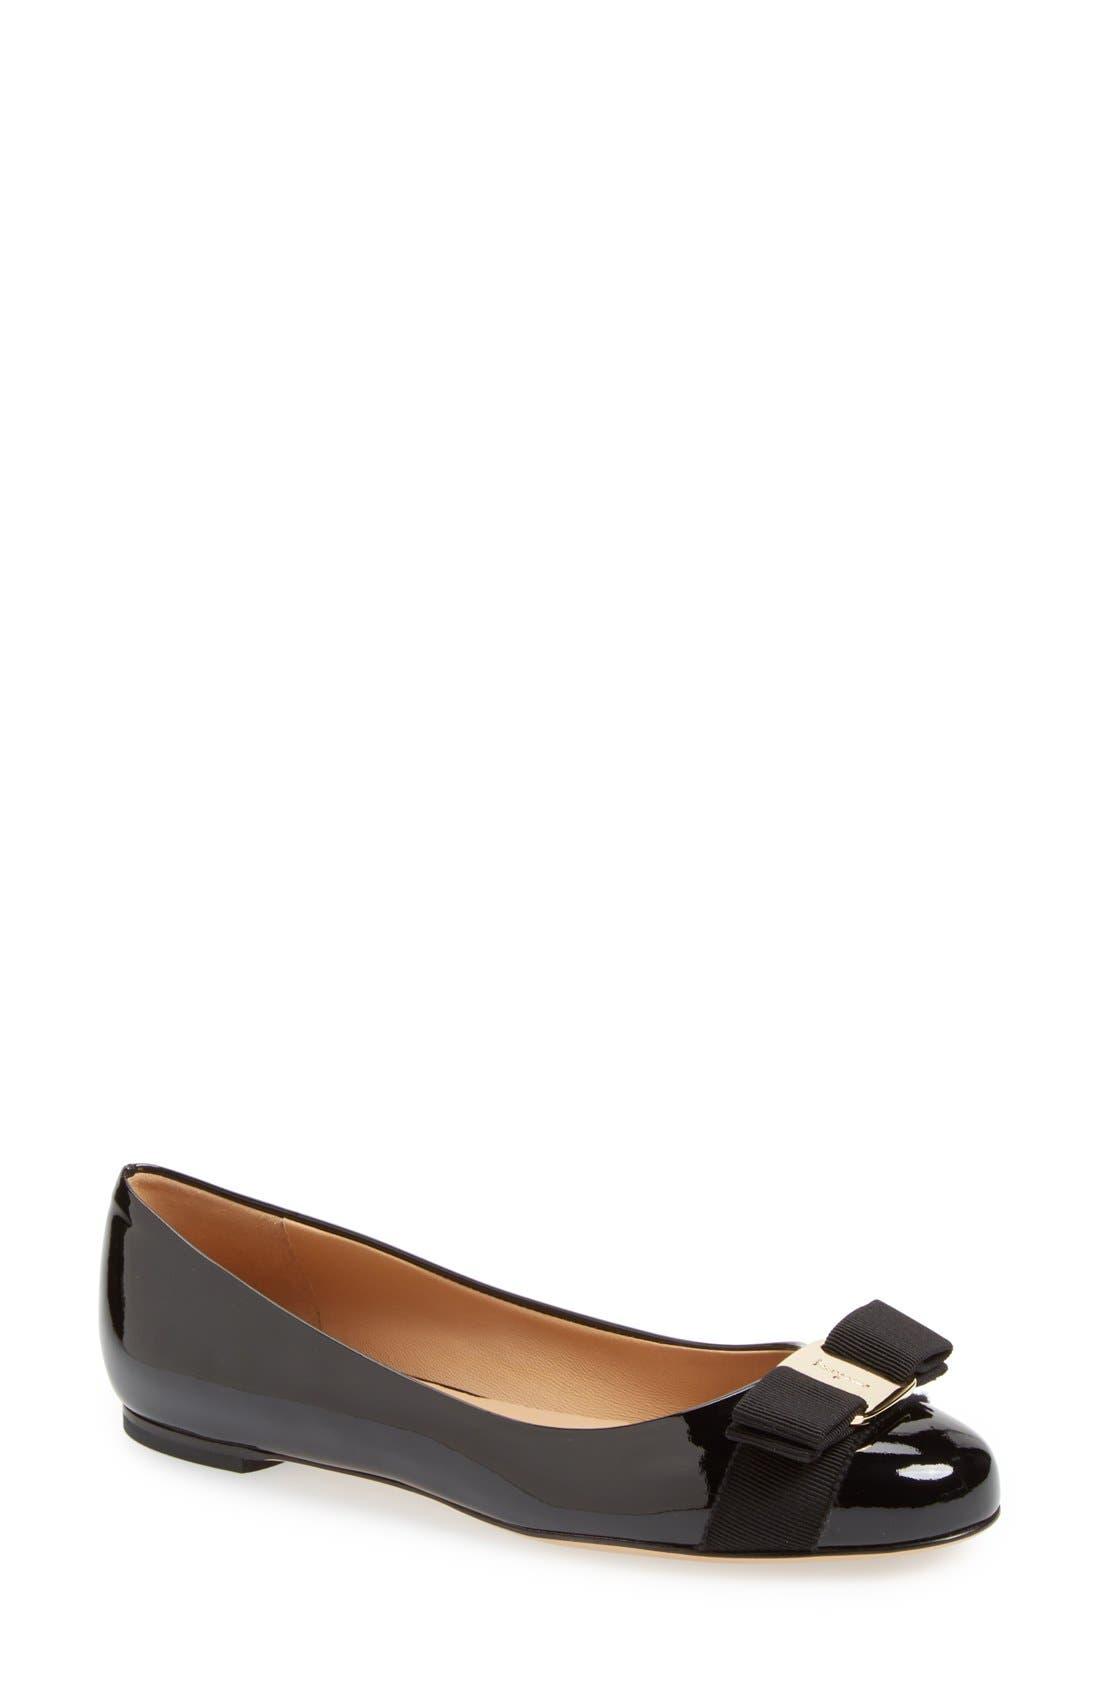 Salvatore Ferragamo Varina Leather Flat